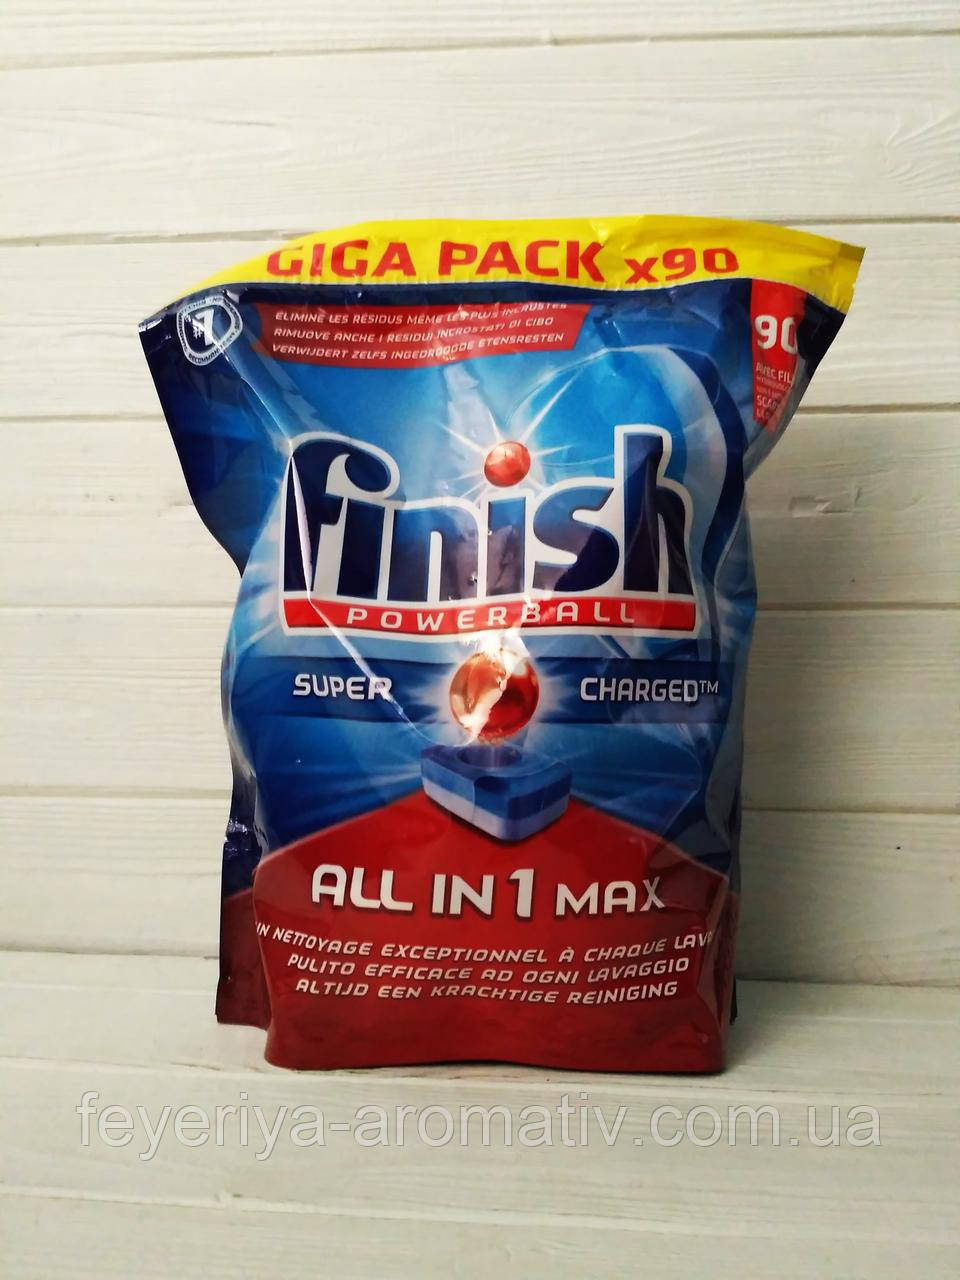 Таблетки для посудомоечной машины Finish Powerball All in1 max 90 шт.